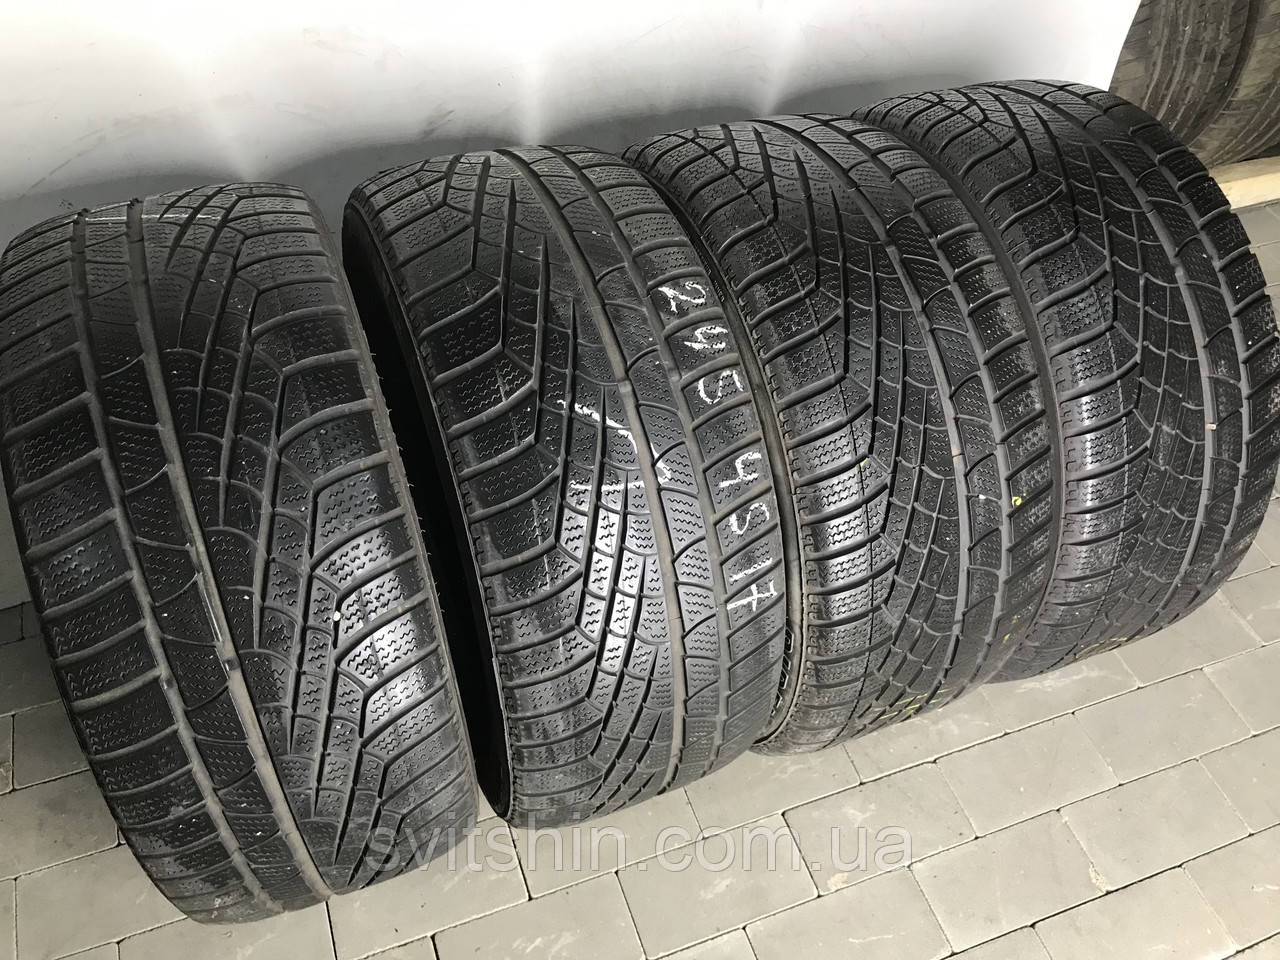 Шины бу зимние 245/45R17 Pirelli Sottozero Winter 240 (5-5.5мм) цена за 1шт!